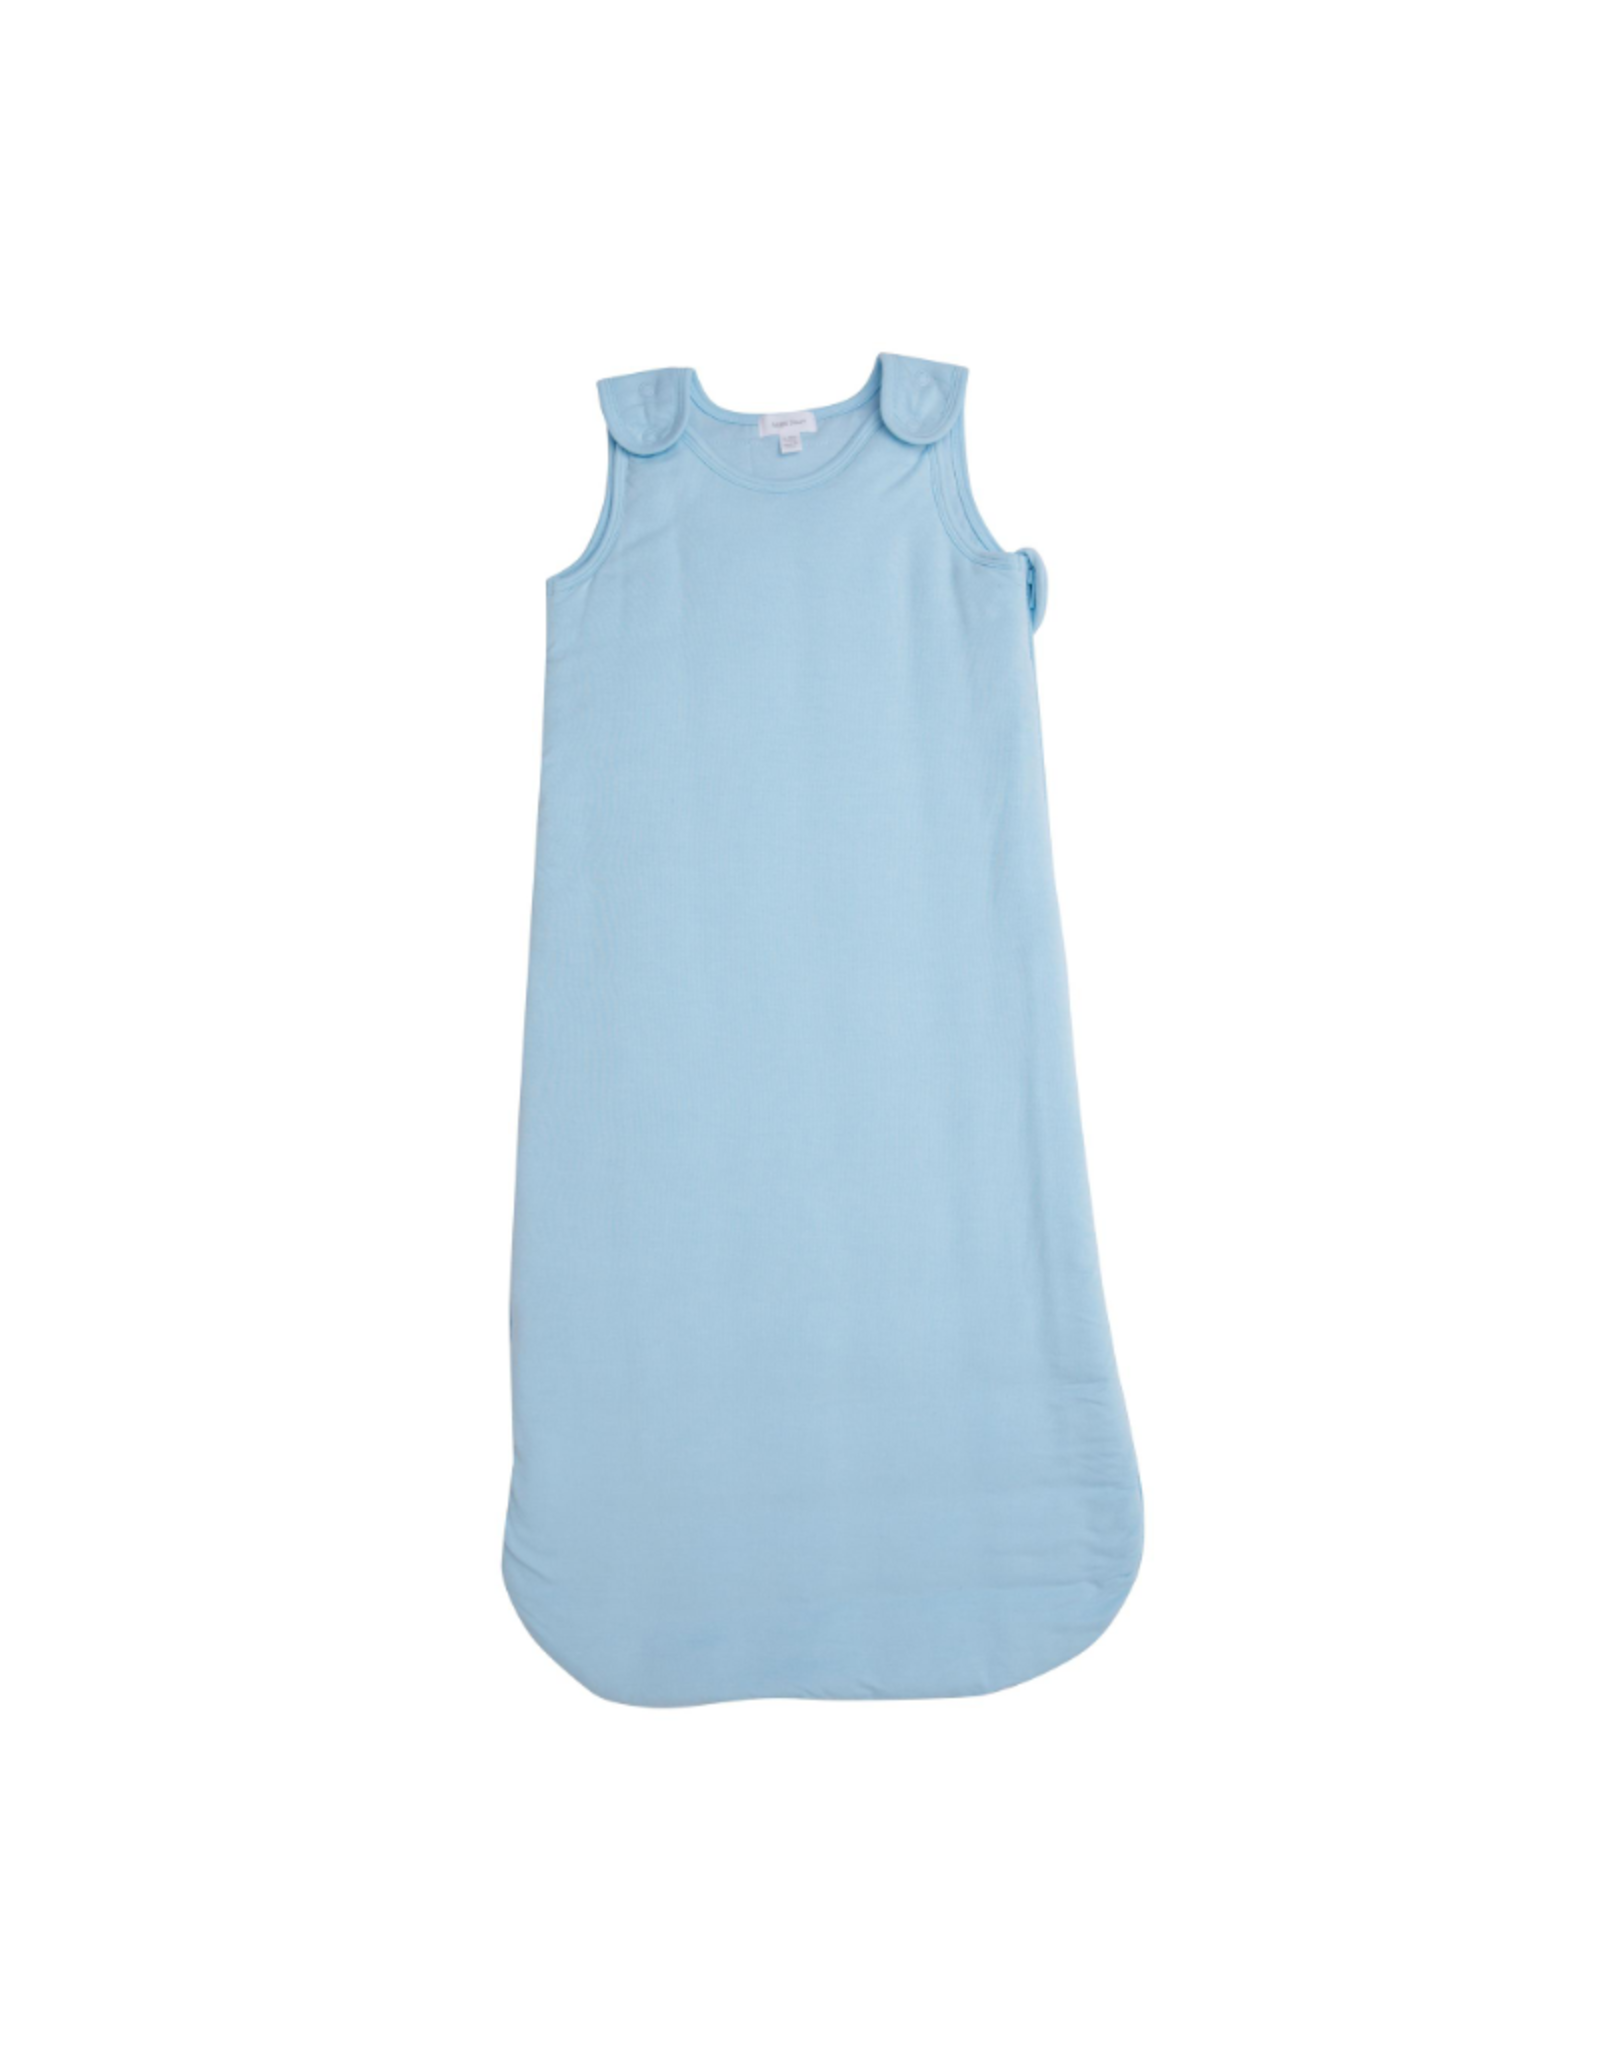 Angel Dear Sleeping Blanket - Classic Blue